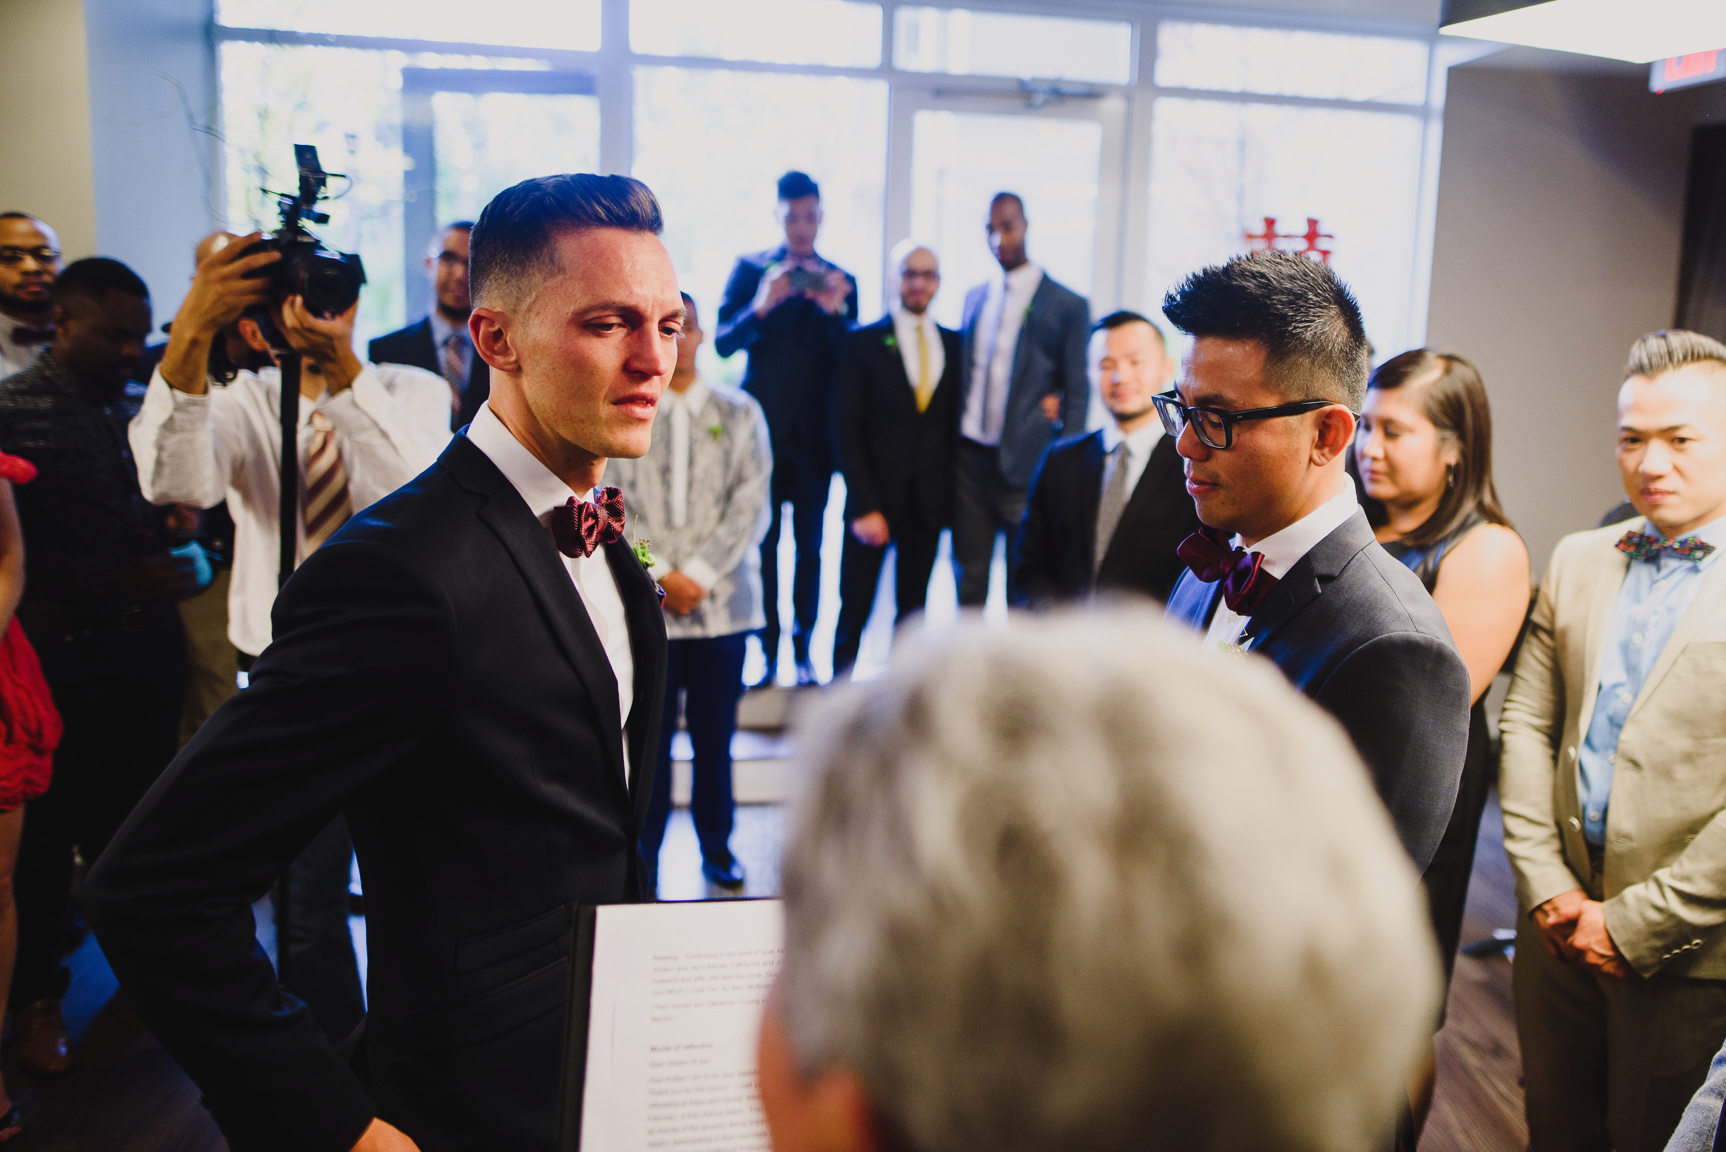 same-sex-wedding-photographer-24.jpg